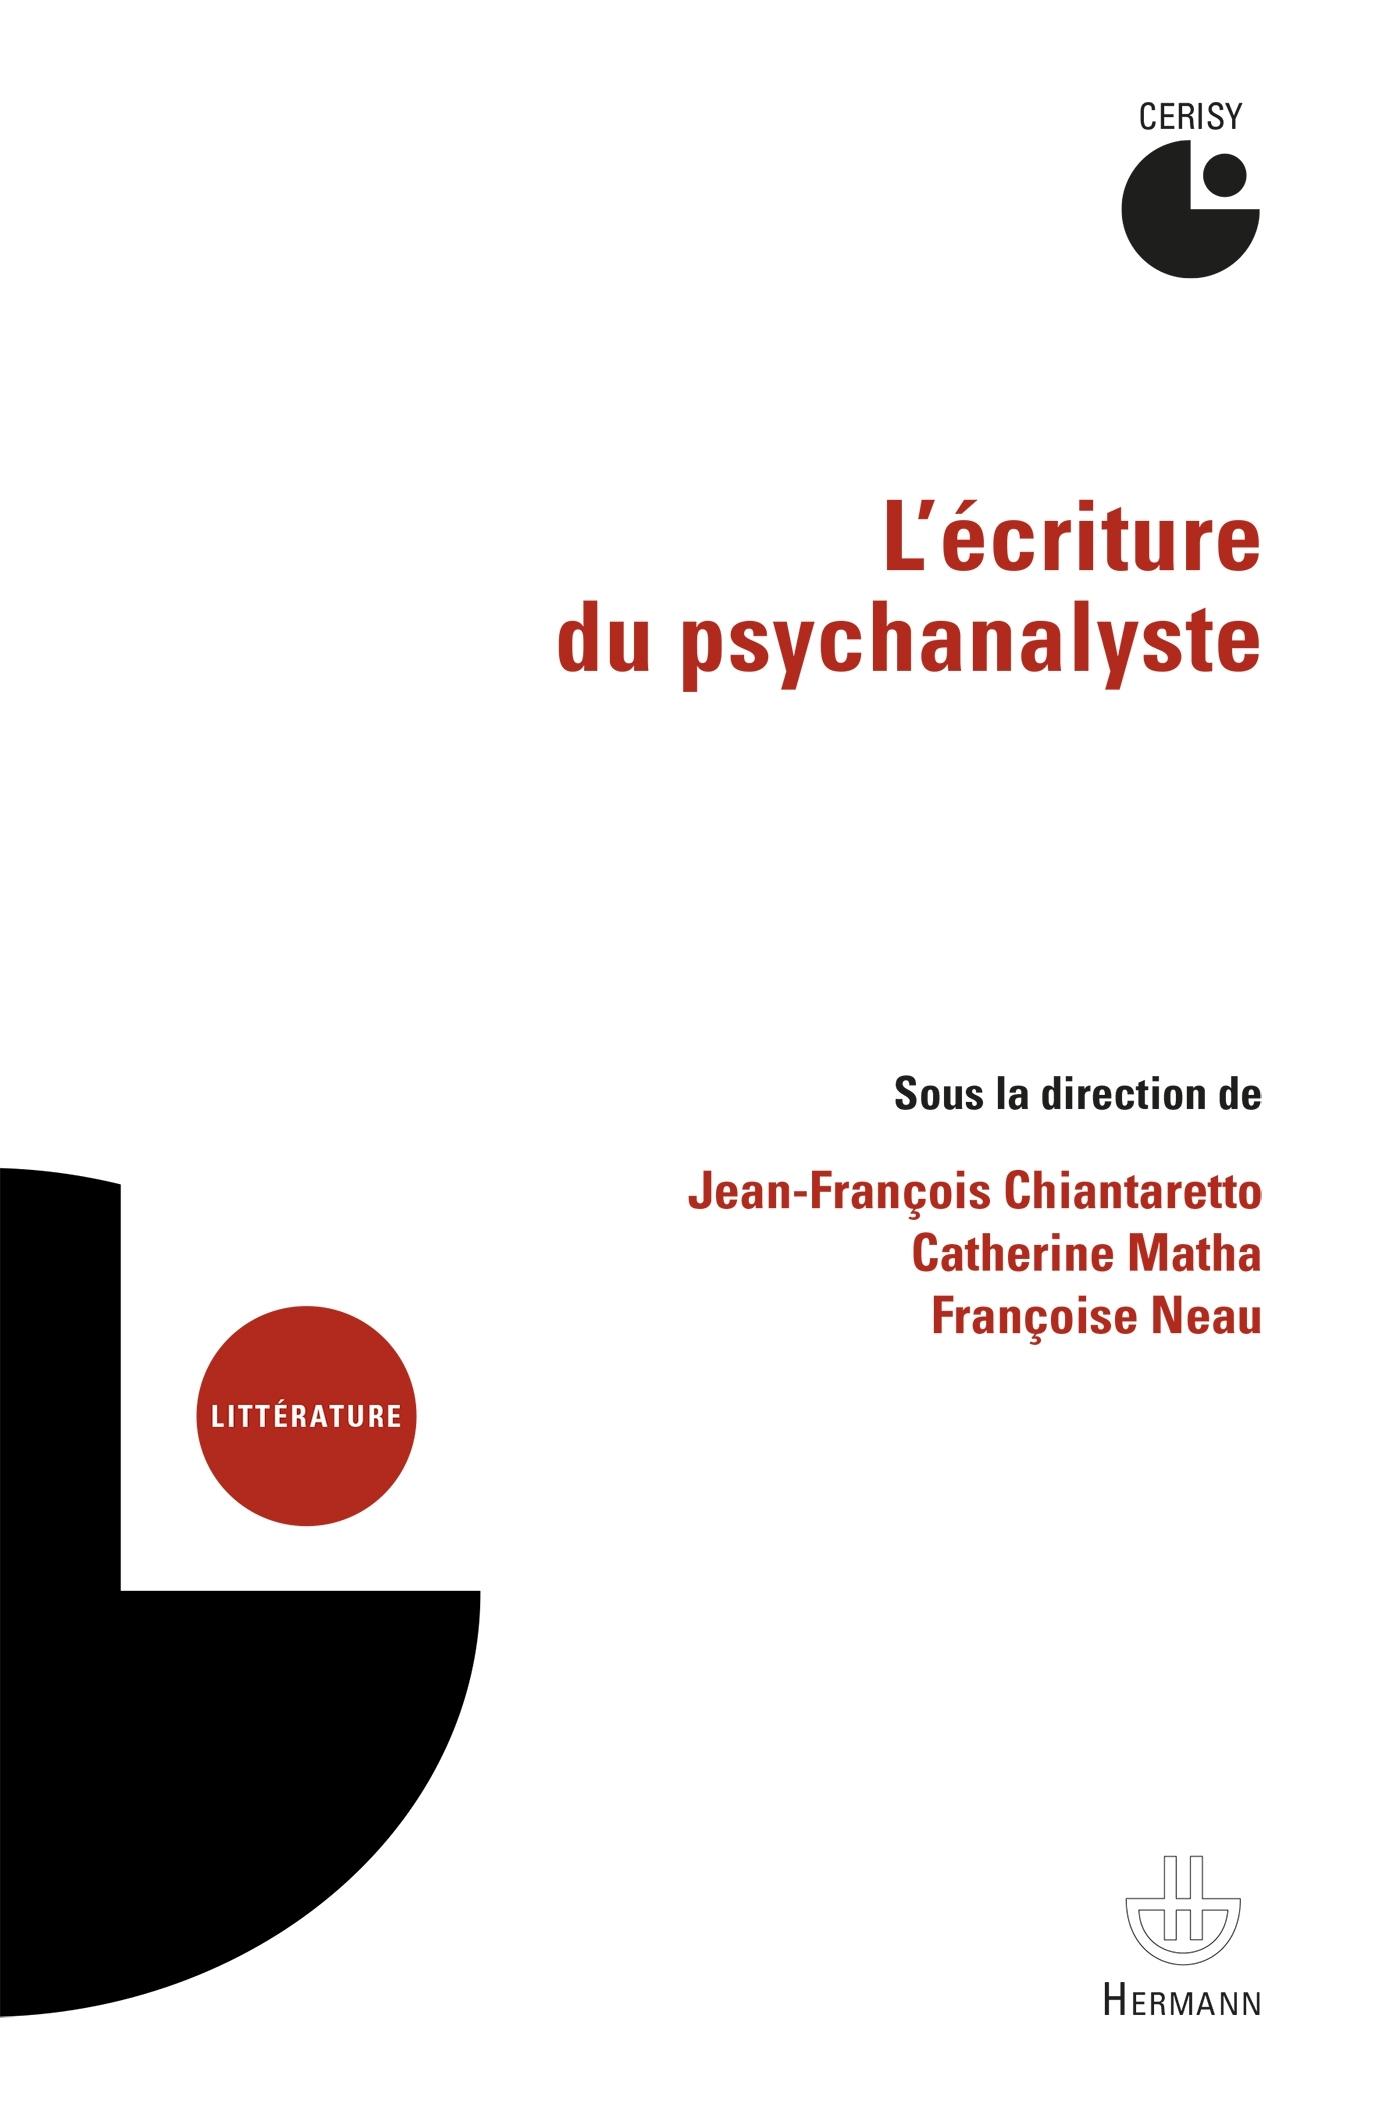 L'ECRITURE DU PSYCHANALYSTE